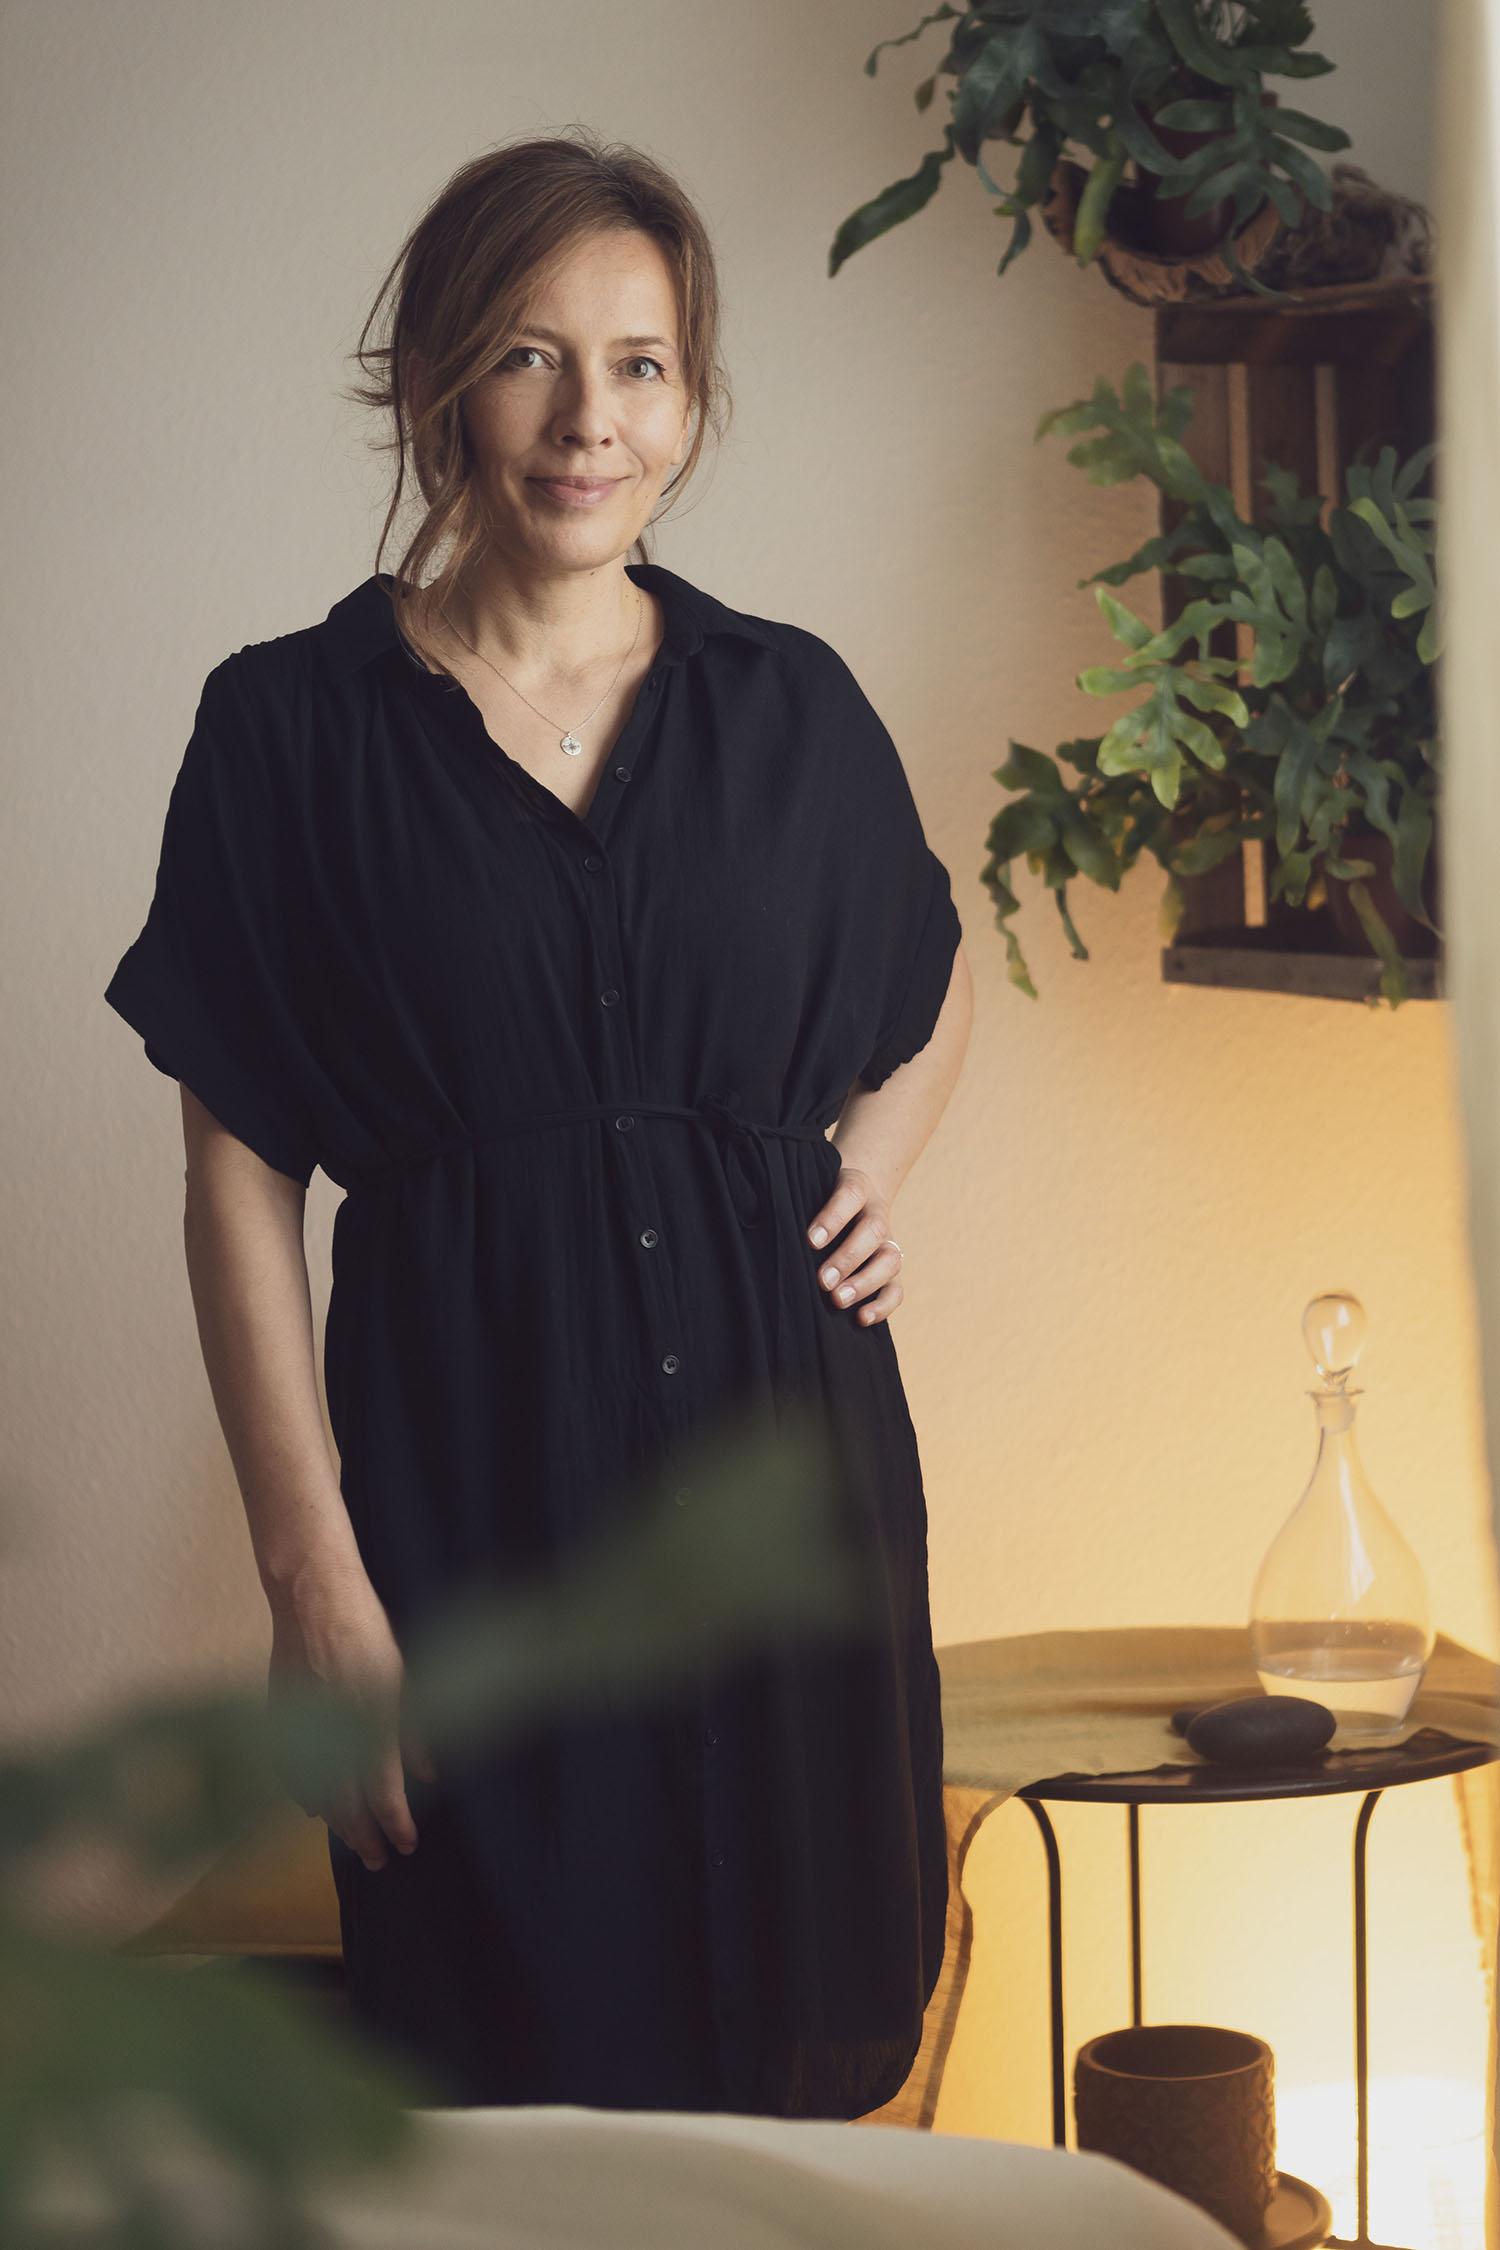 Naturkosmetik Singen Sandra Klausien